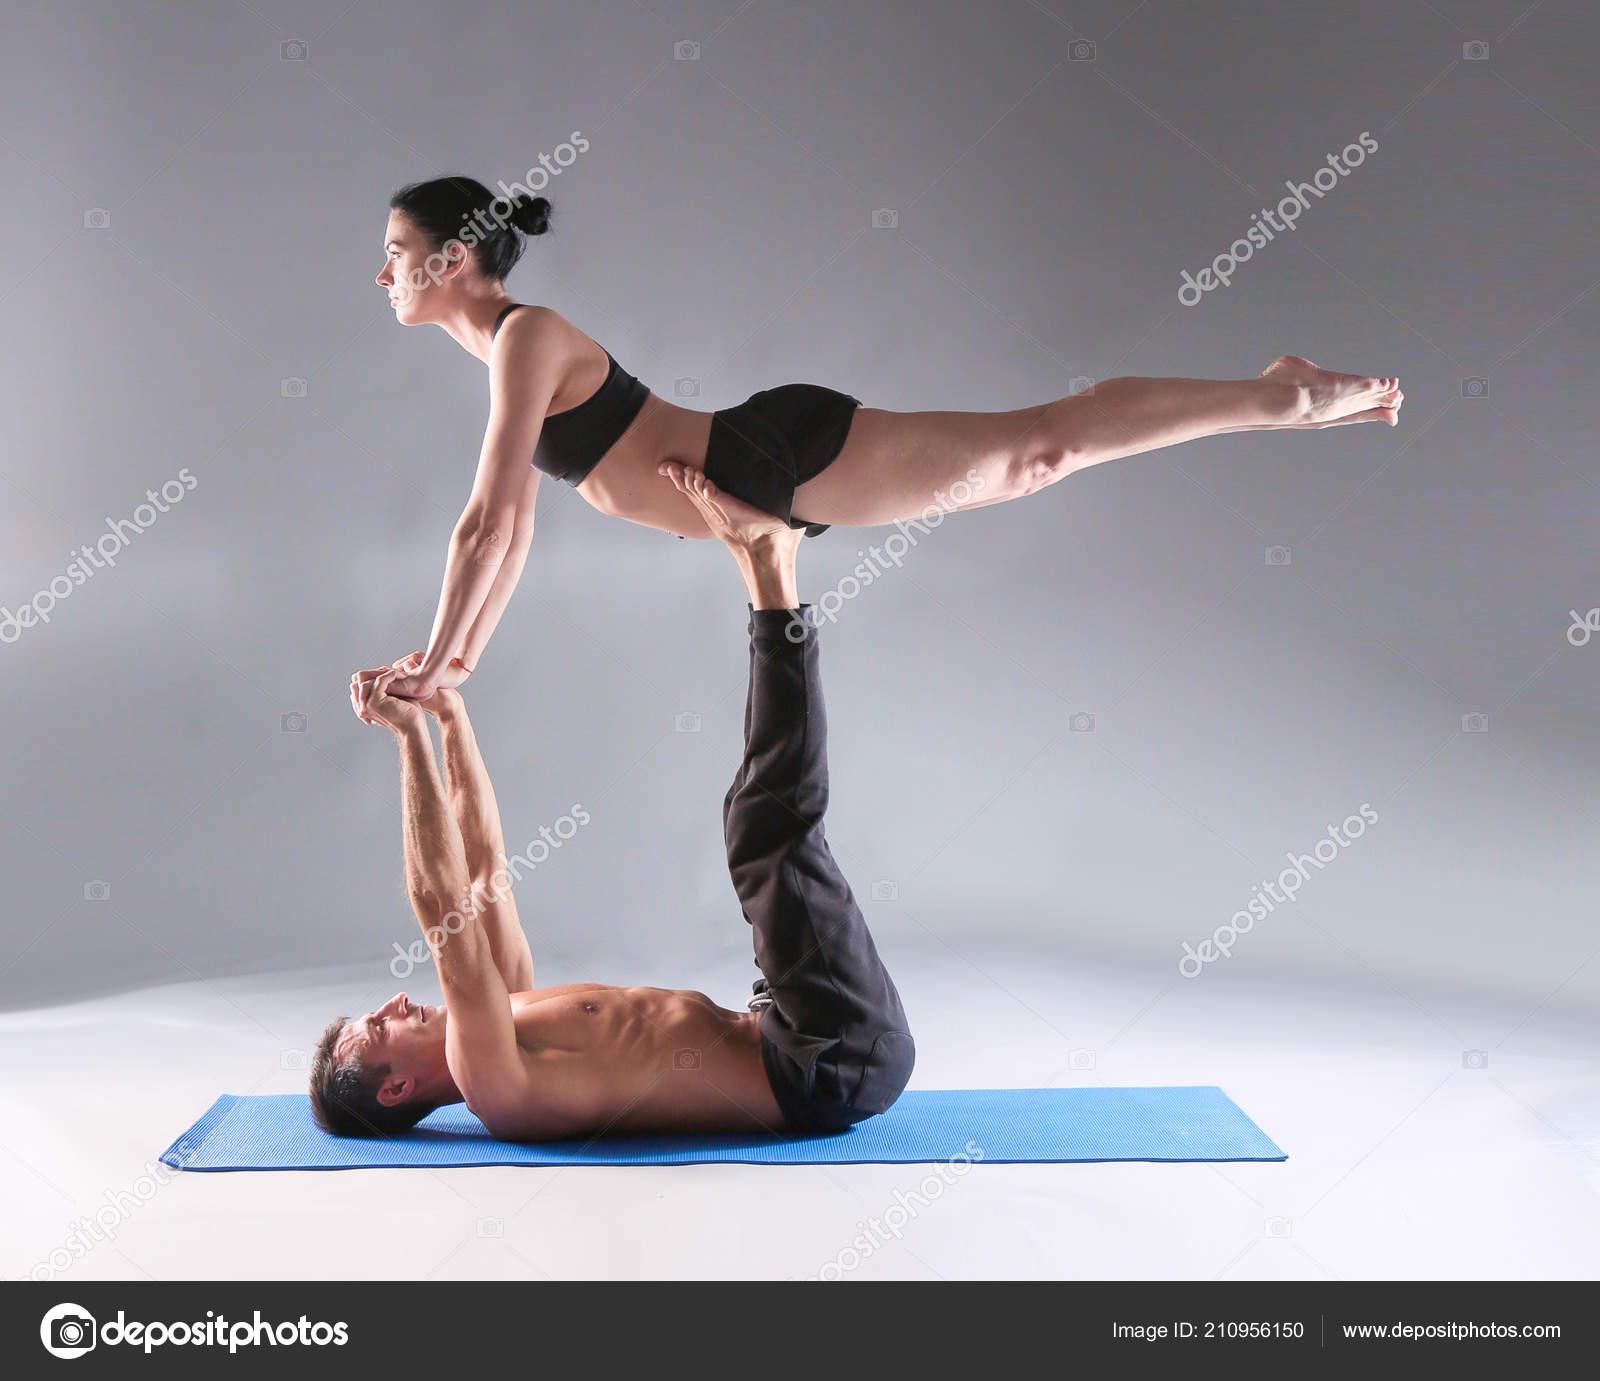 Pareja joven practicando yoga acro en mat en estudio juntos. Acroyoga. Yoga  en pareja f432f19fe1bb